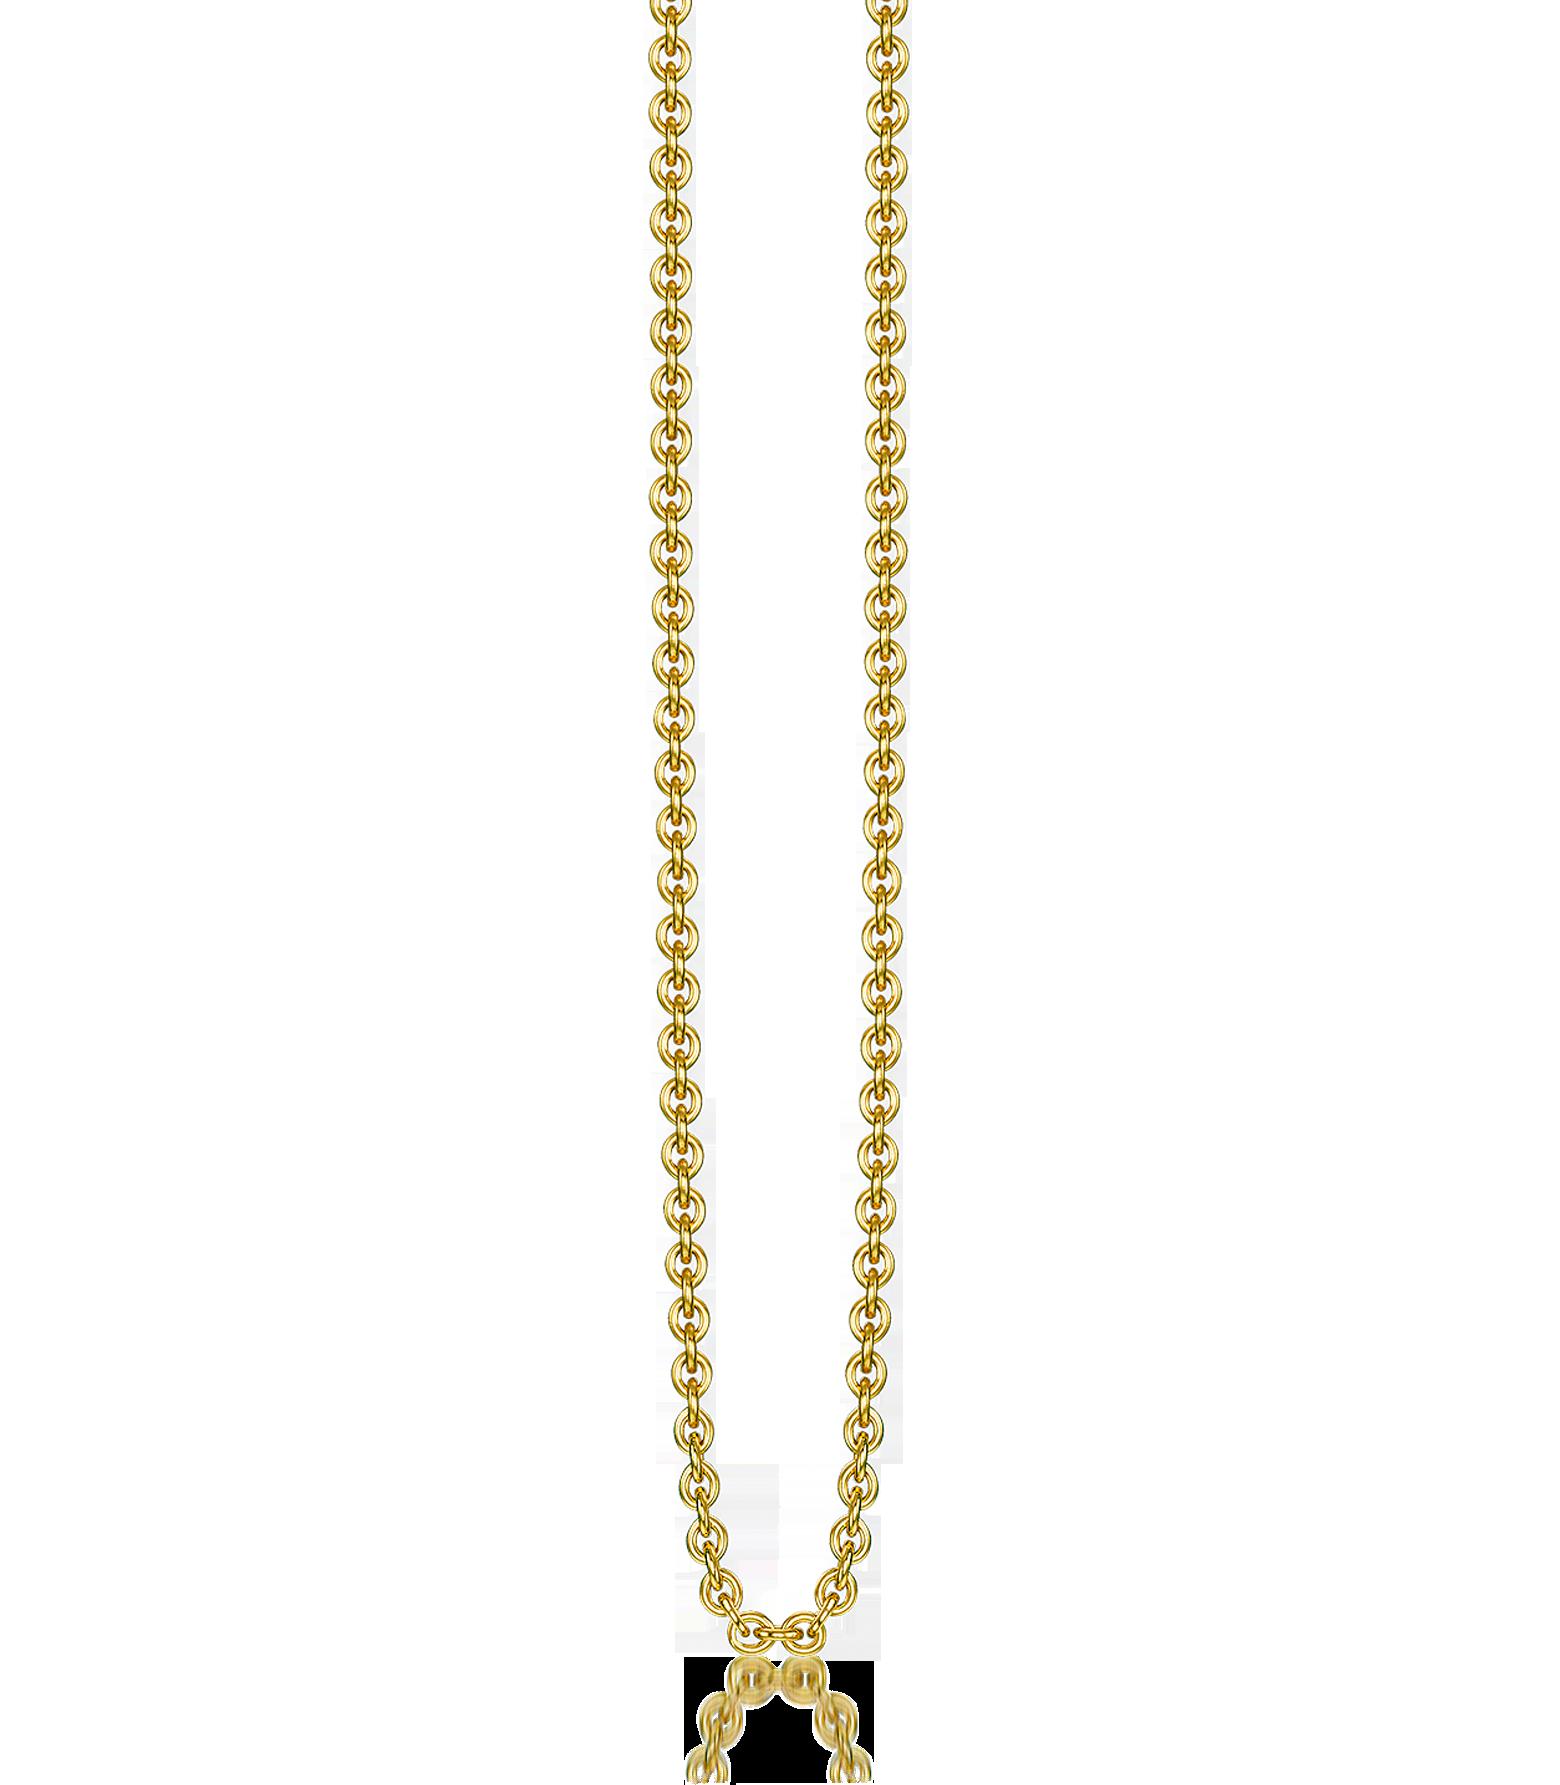 Joyas - Thomas Sabo Gold Plated Sterling Silver Anchor Chain Necklace De moda ts290018-062-00 JAQVWNX